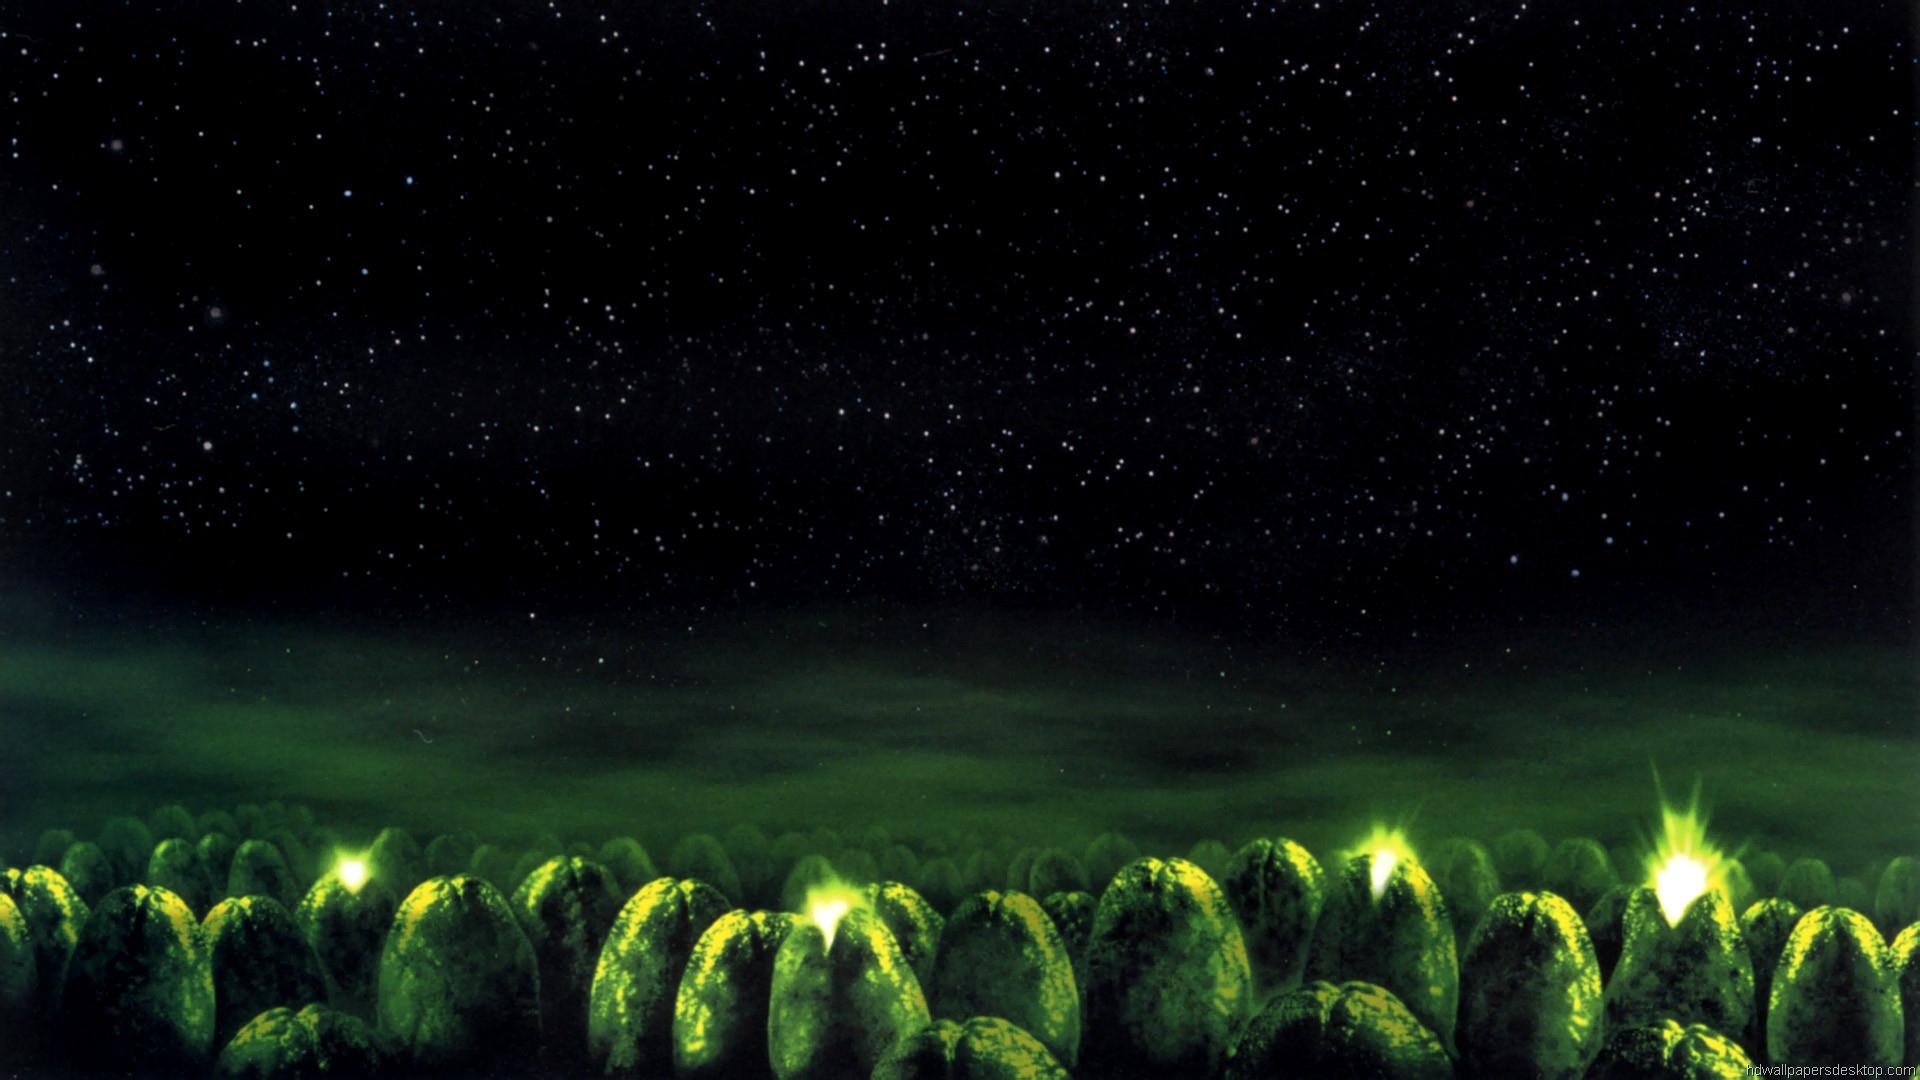 Alien Movie Wallpaper 1920x1080